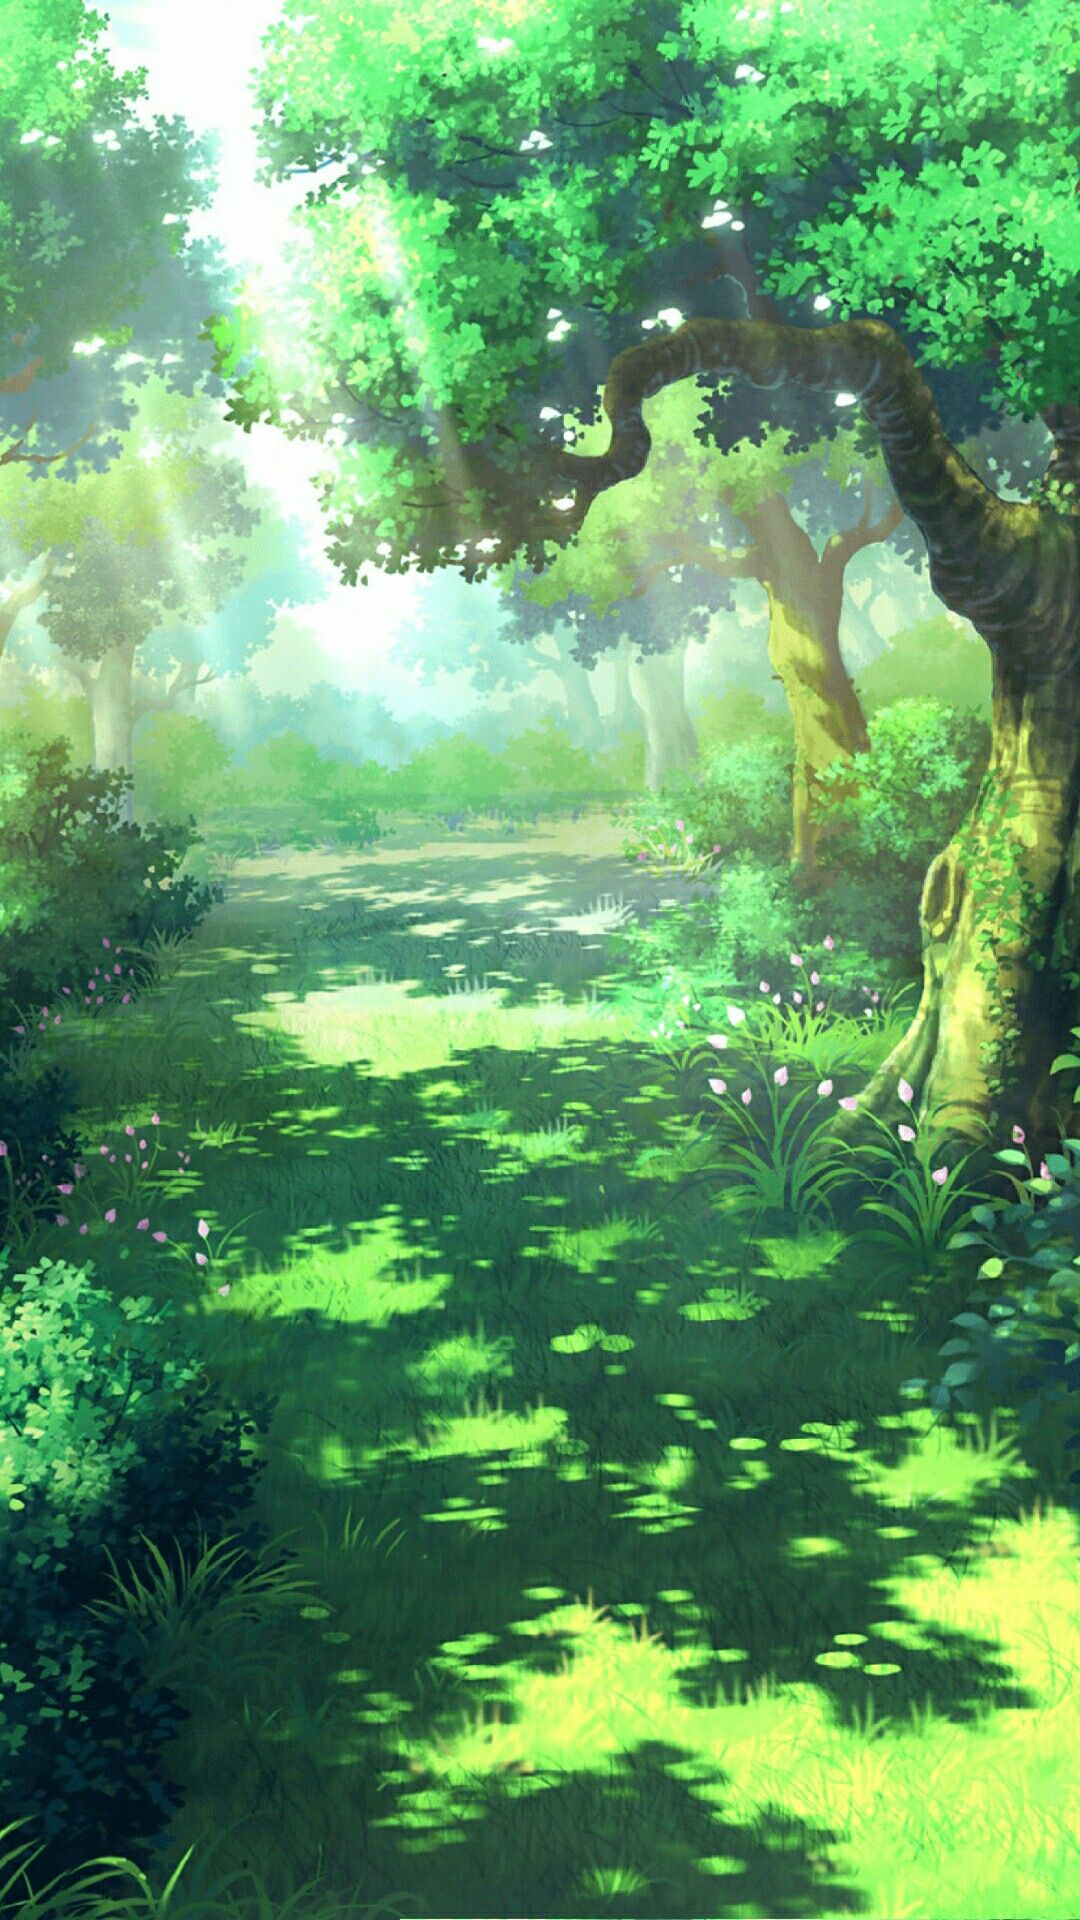 Background Animasi Hutan : background, animasi, hutan, Animasi, Scenery, Wallpaper,, Anime, Scenery,, Fantasy, Landscape